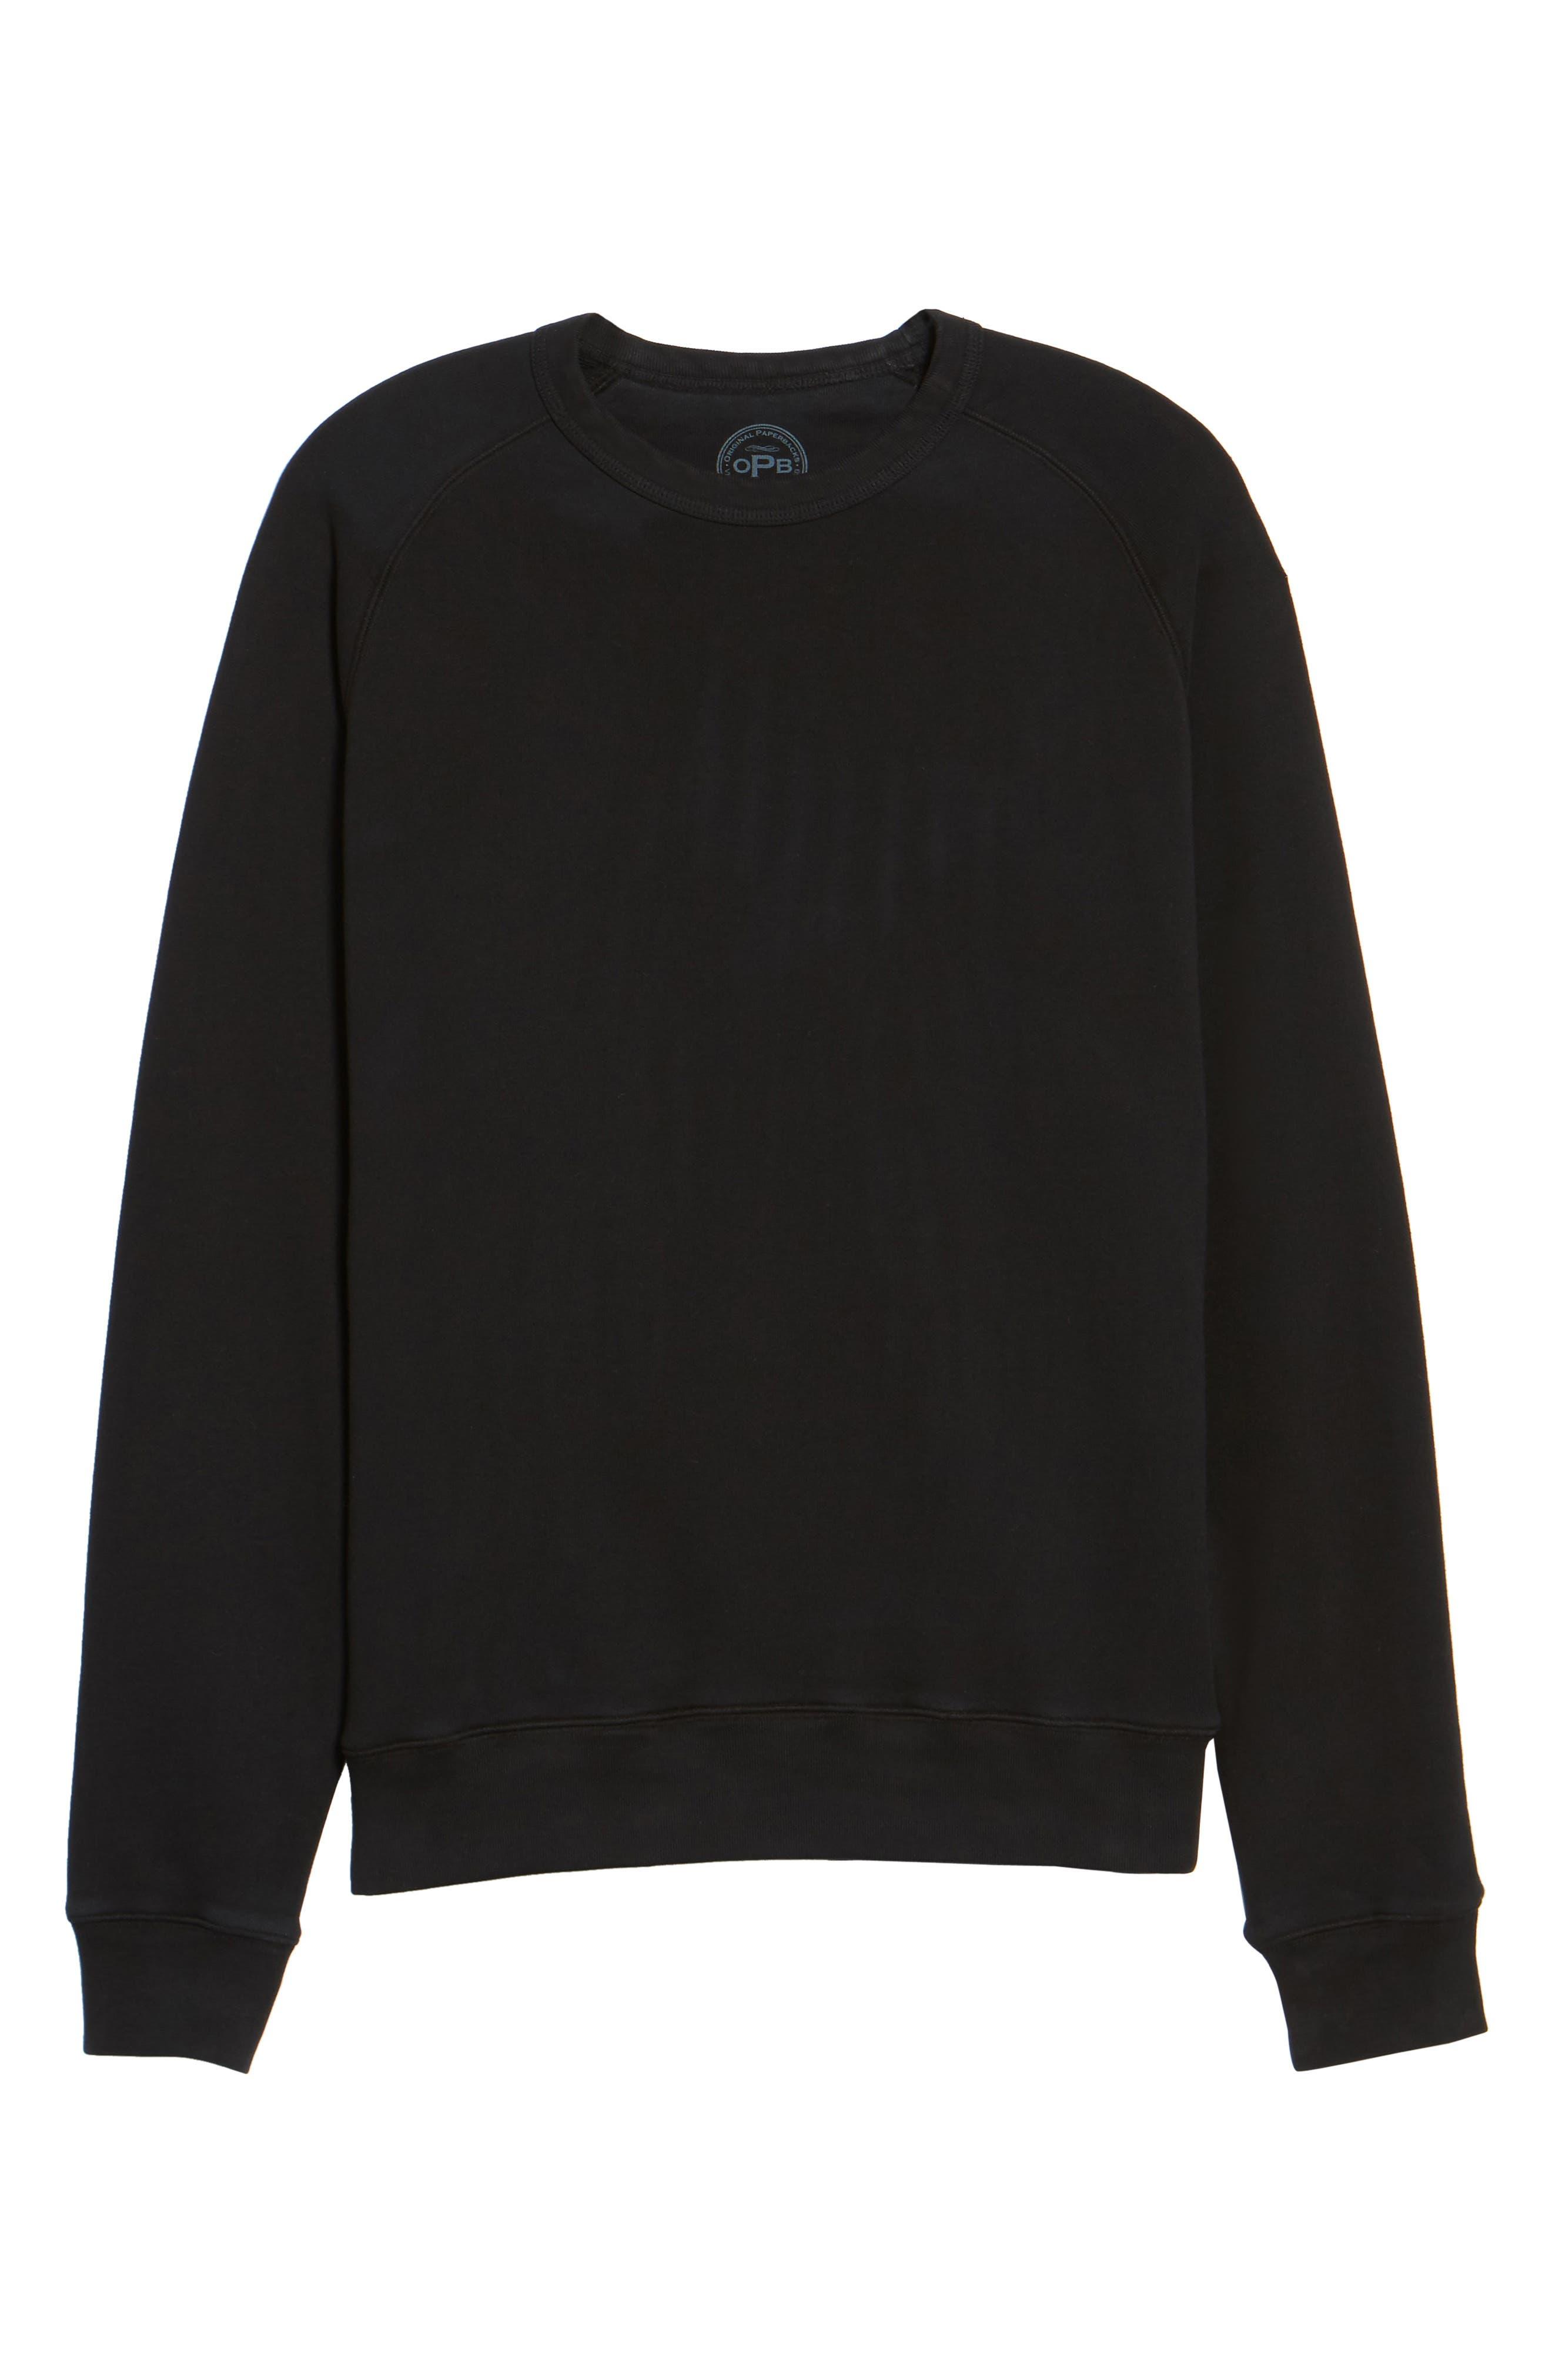 South Sea Raglan Sweatshirt,                             Alternate thumbnail 16, color,